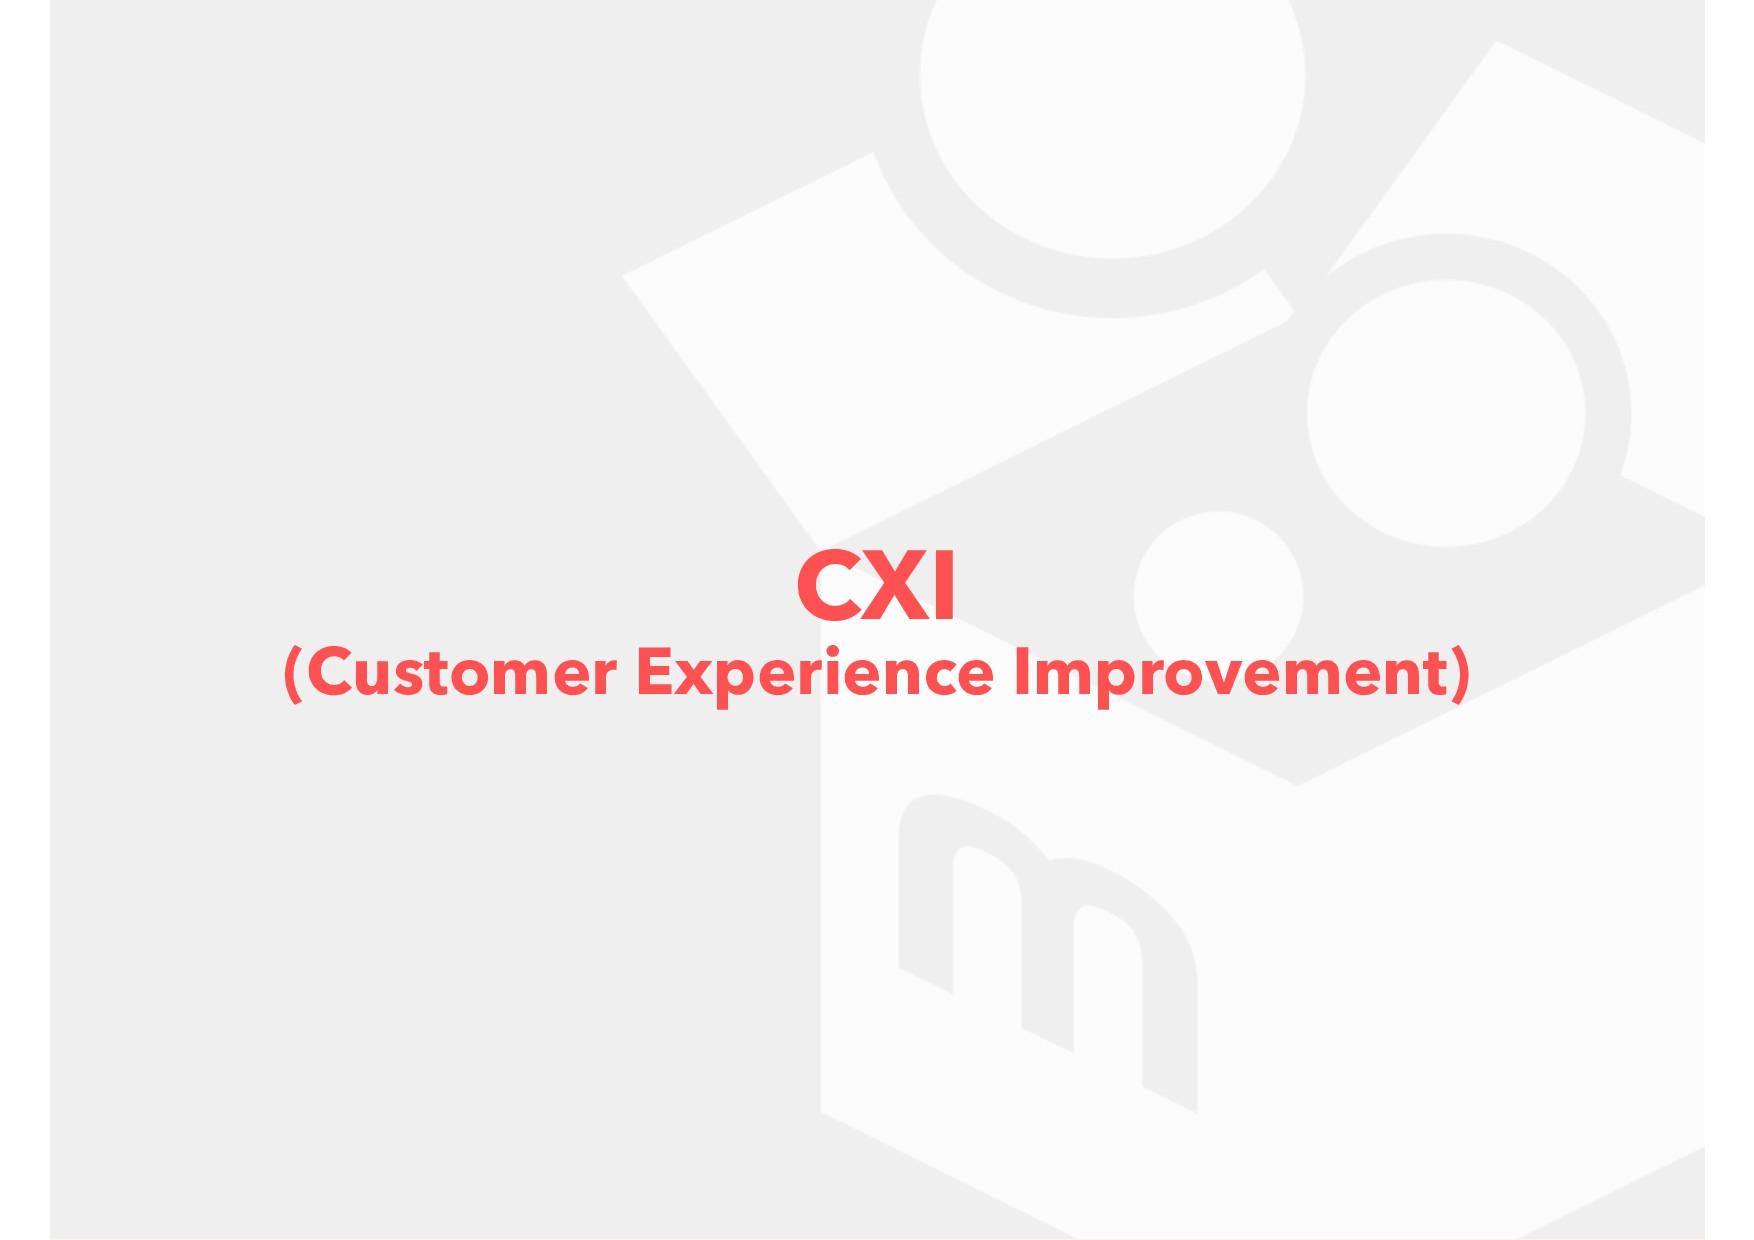 CXI (Customer Experience Improvement)